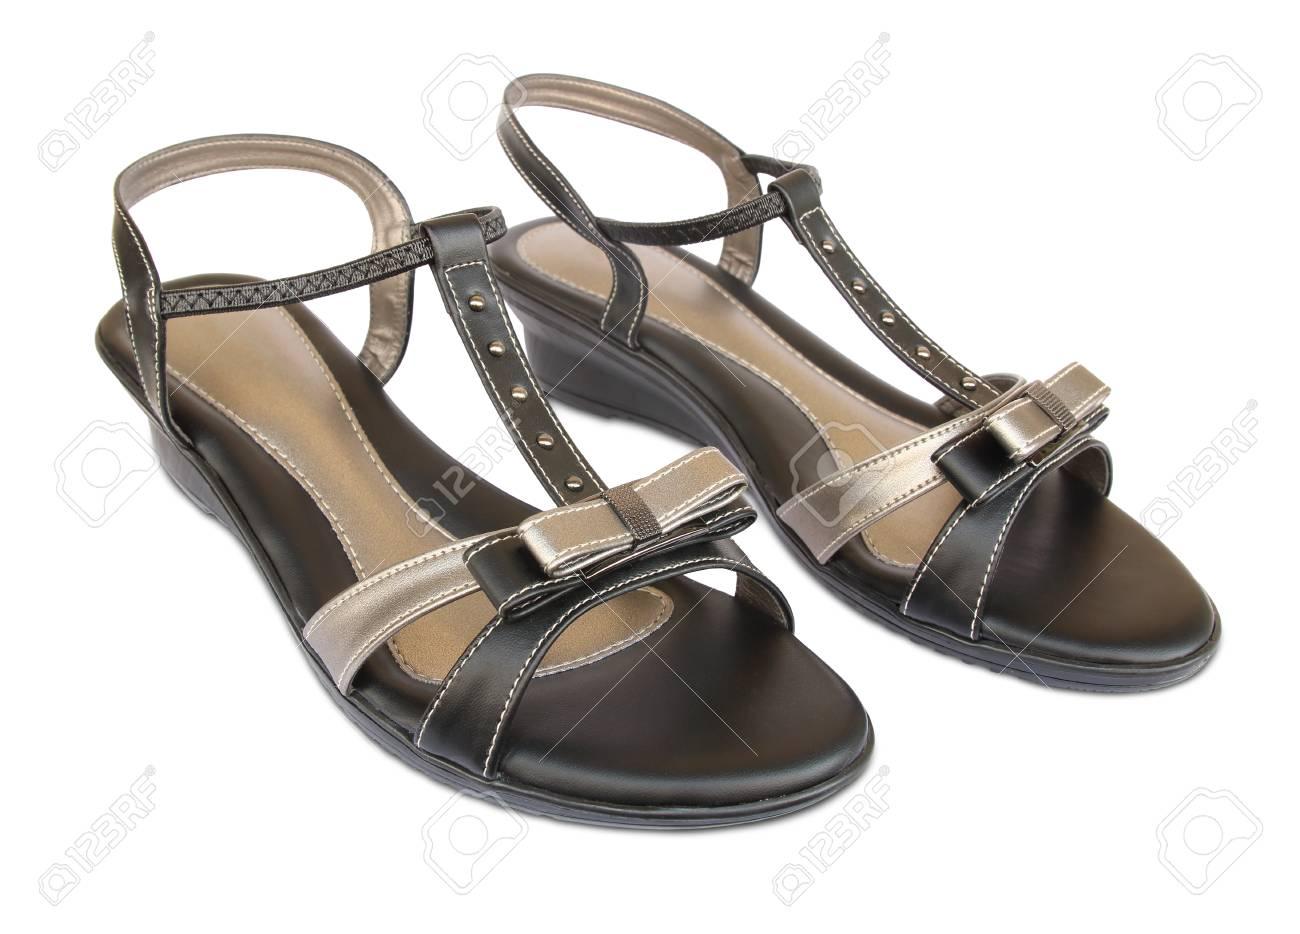 173fce8f9b538 Female leather sandals isolated on white background. Stock Photo - 92117763